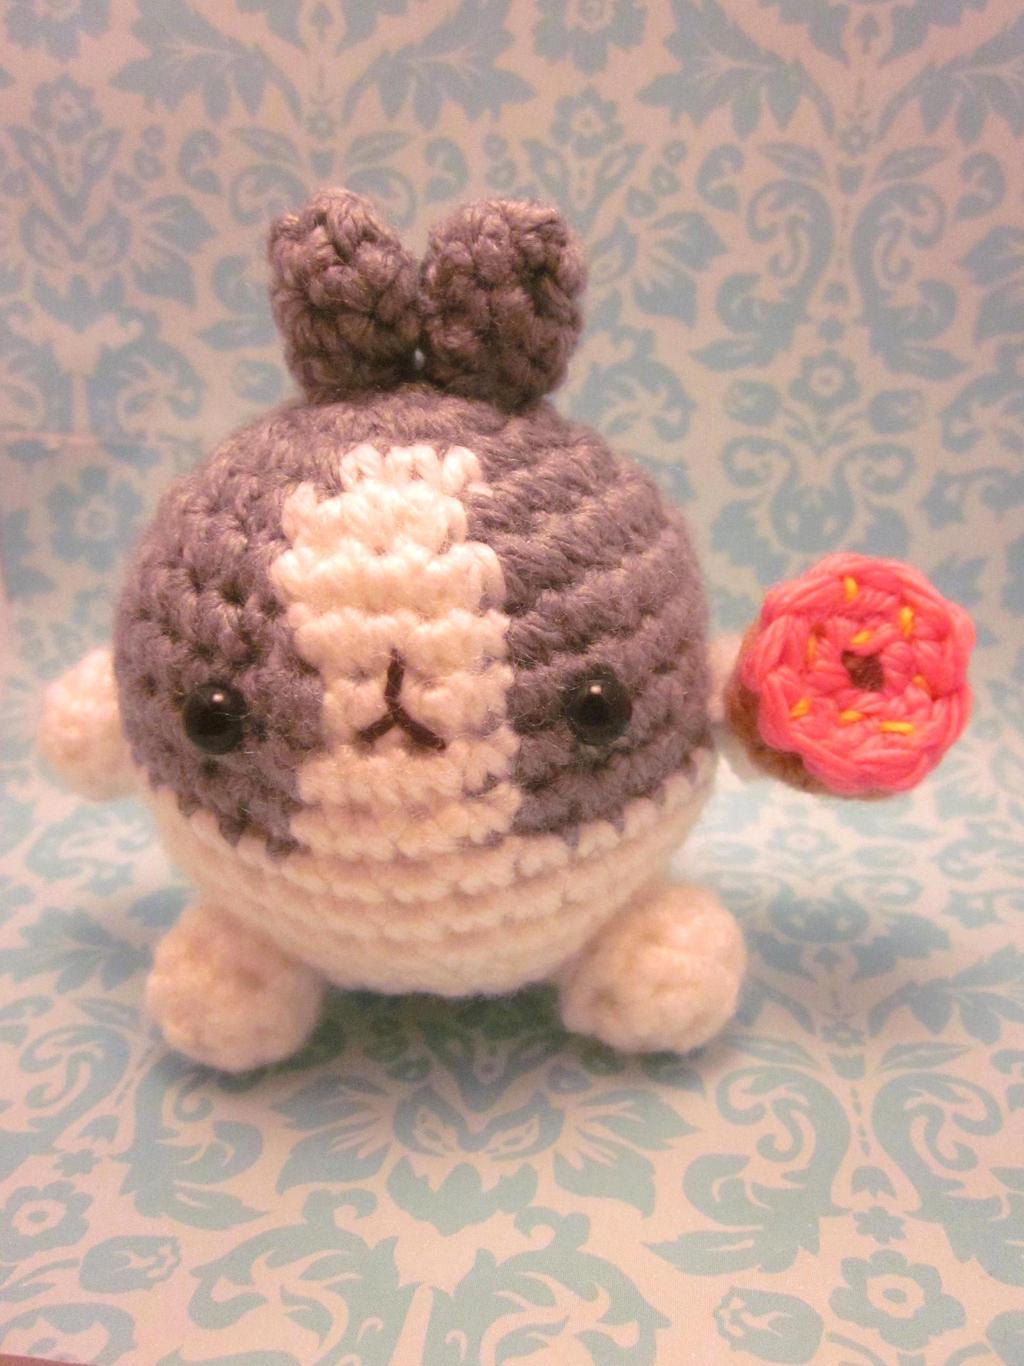 Free Crochet Bunny Pattern Kawaii Bunnies - Hooked On Patterns   1366x1024